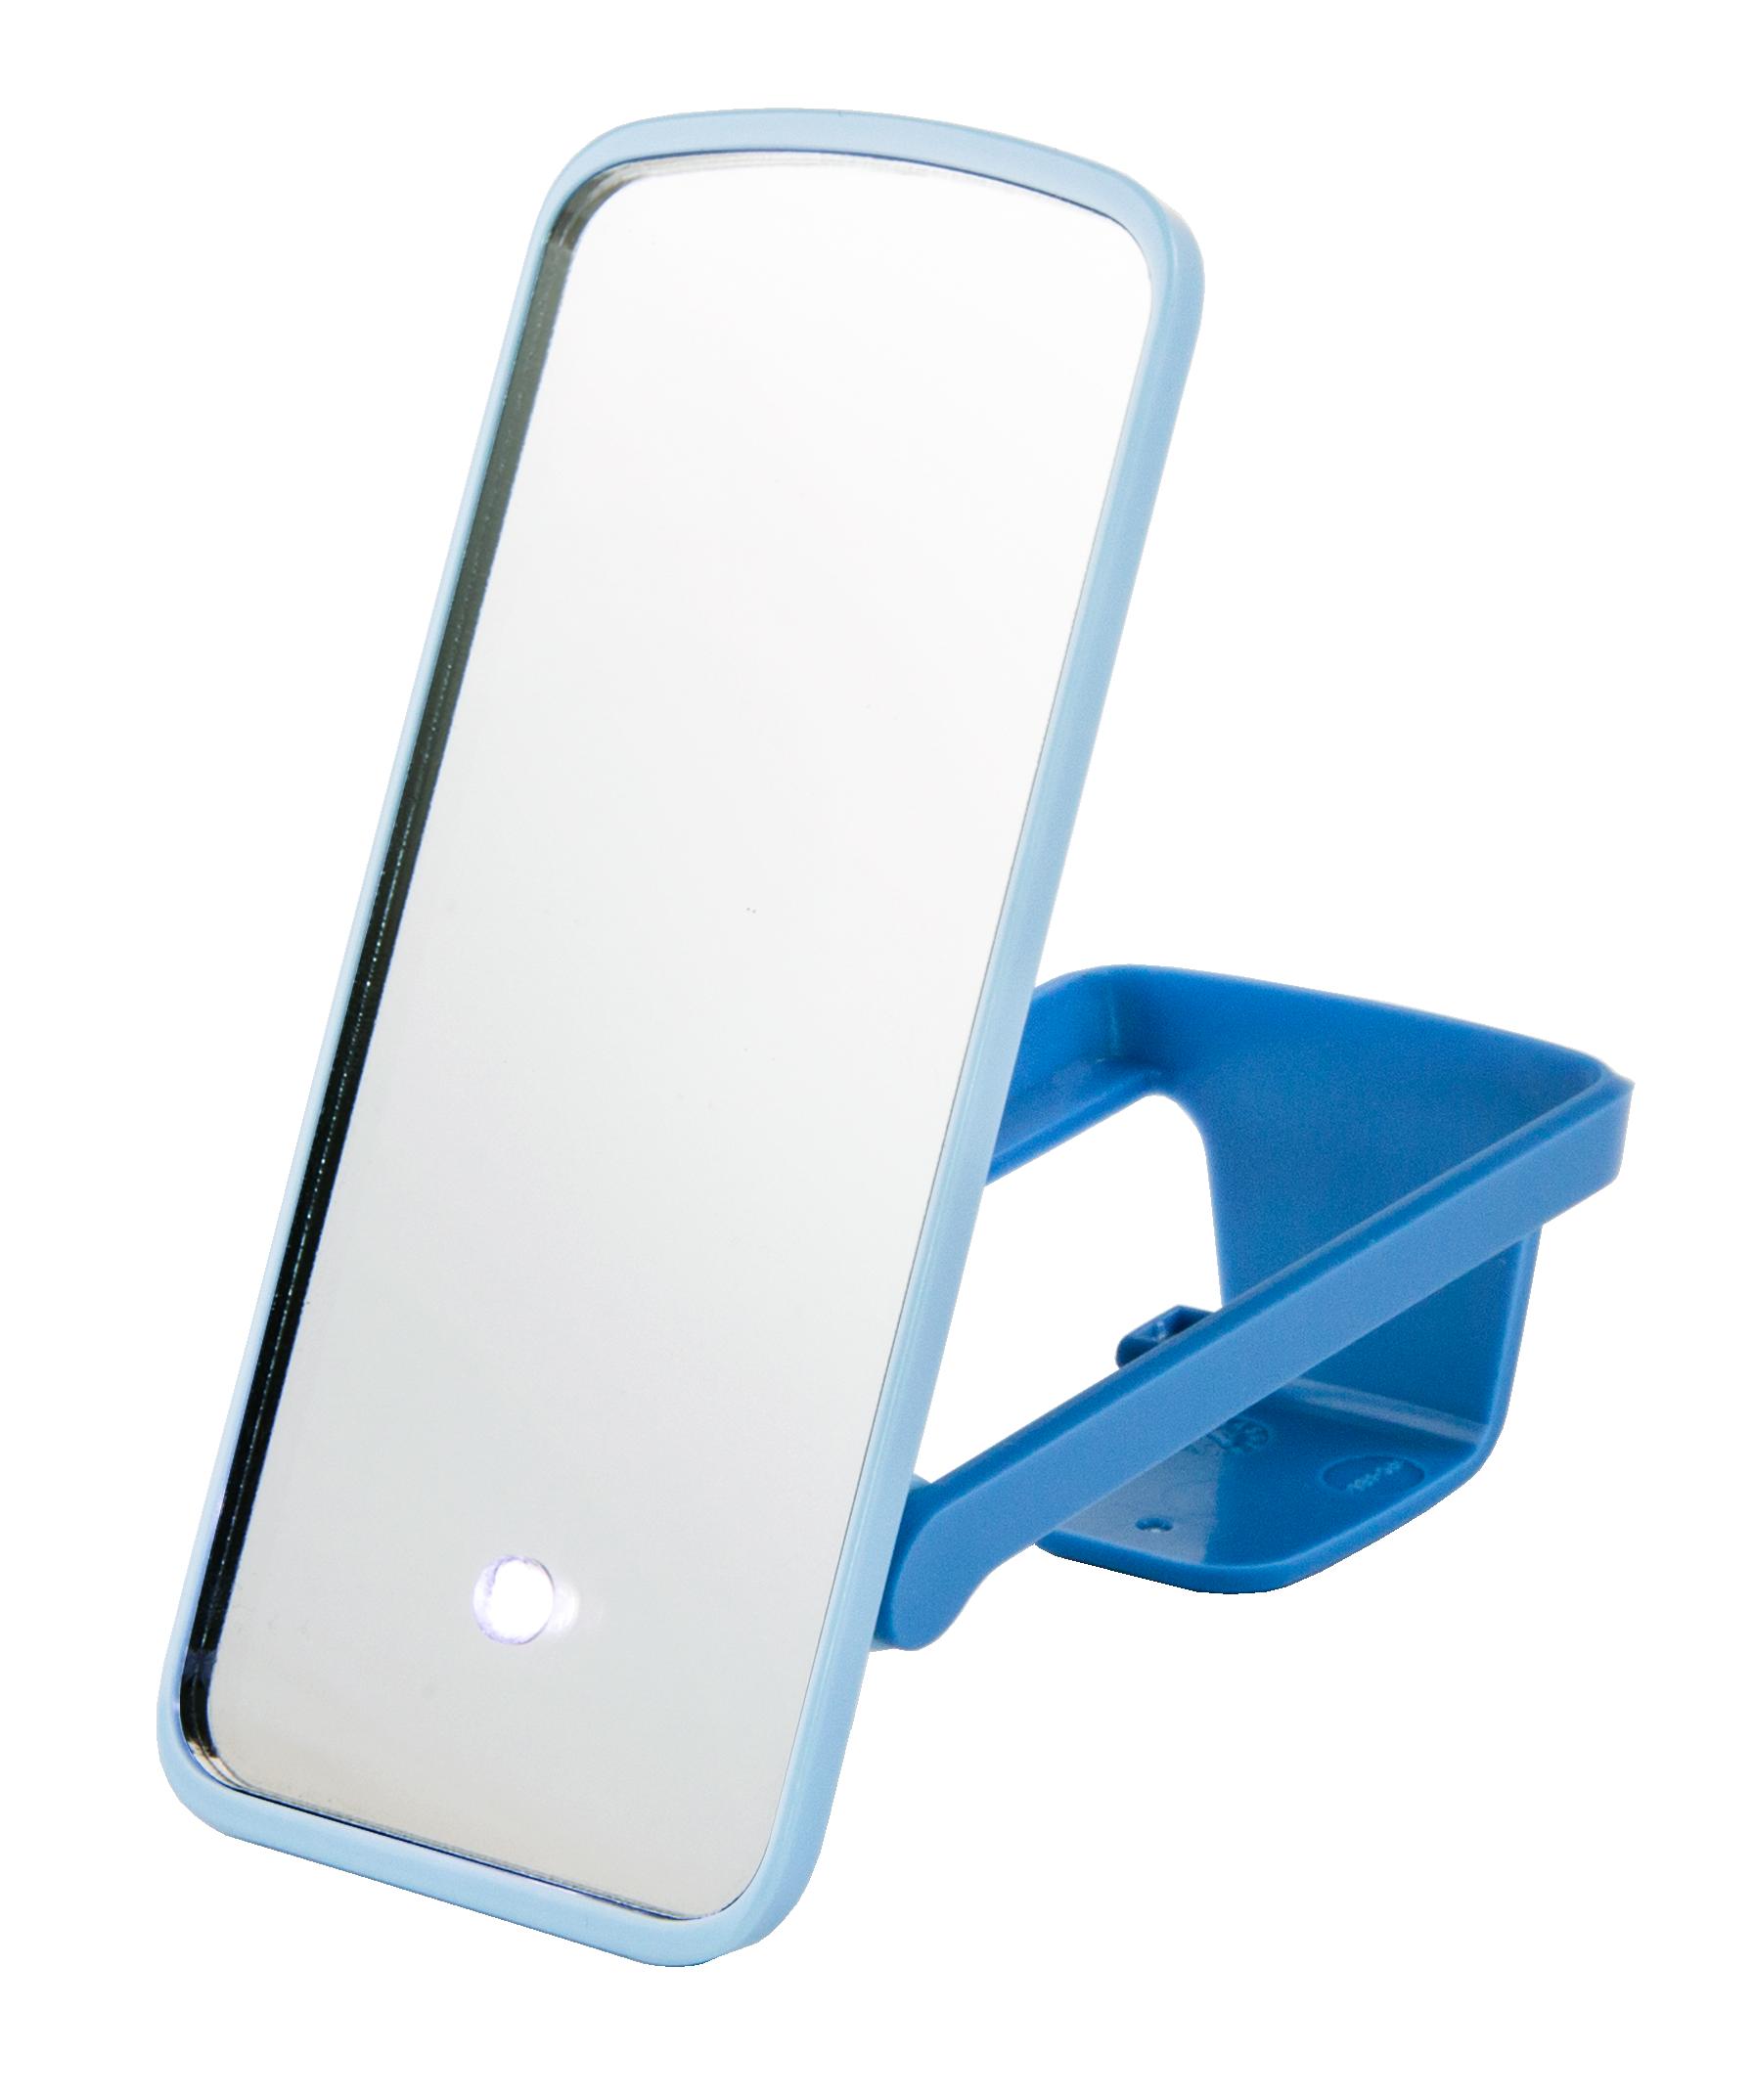 Bright, mirror that helps with self-catheterizaton CISC